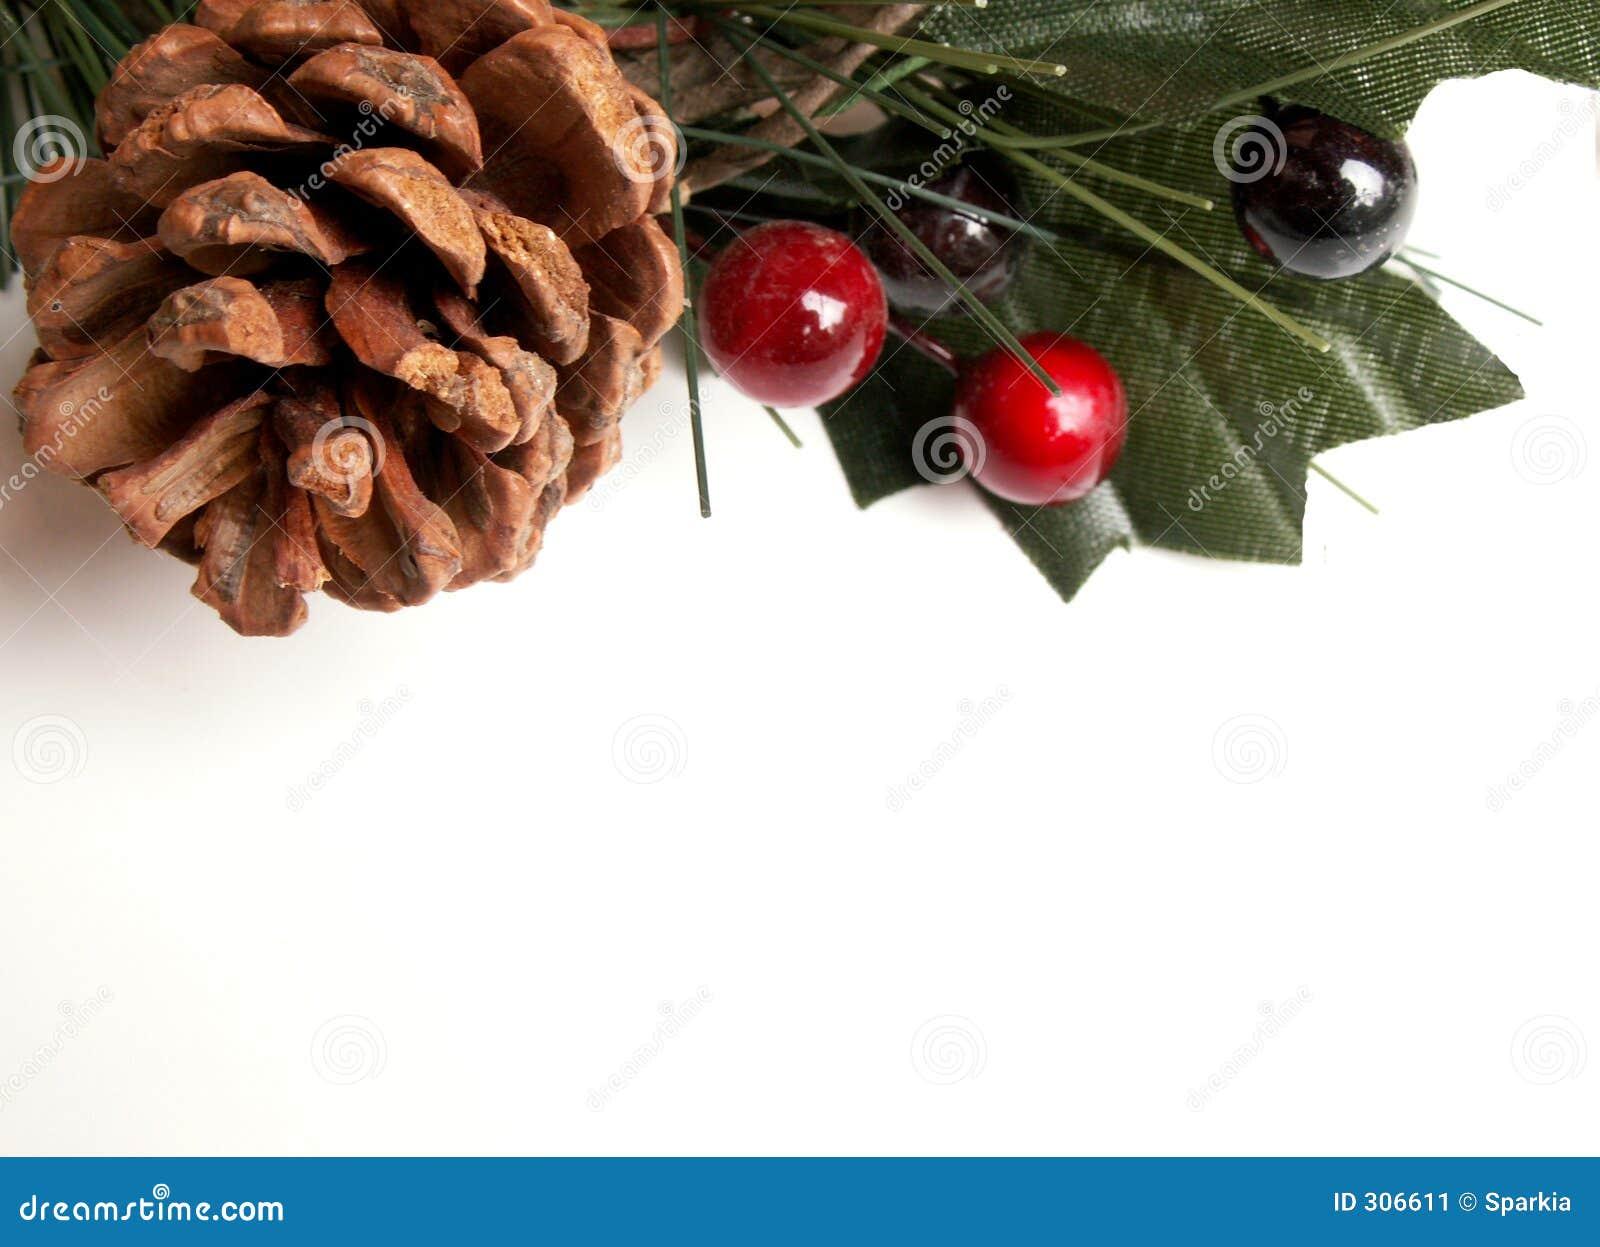 Christmas Greenery Stock Image Image Of Flowering